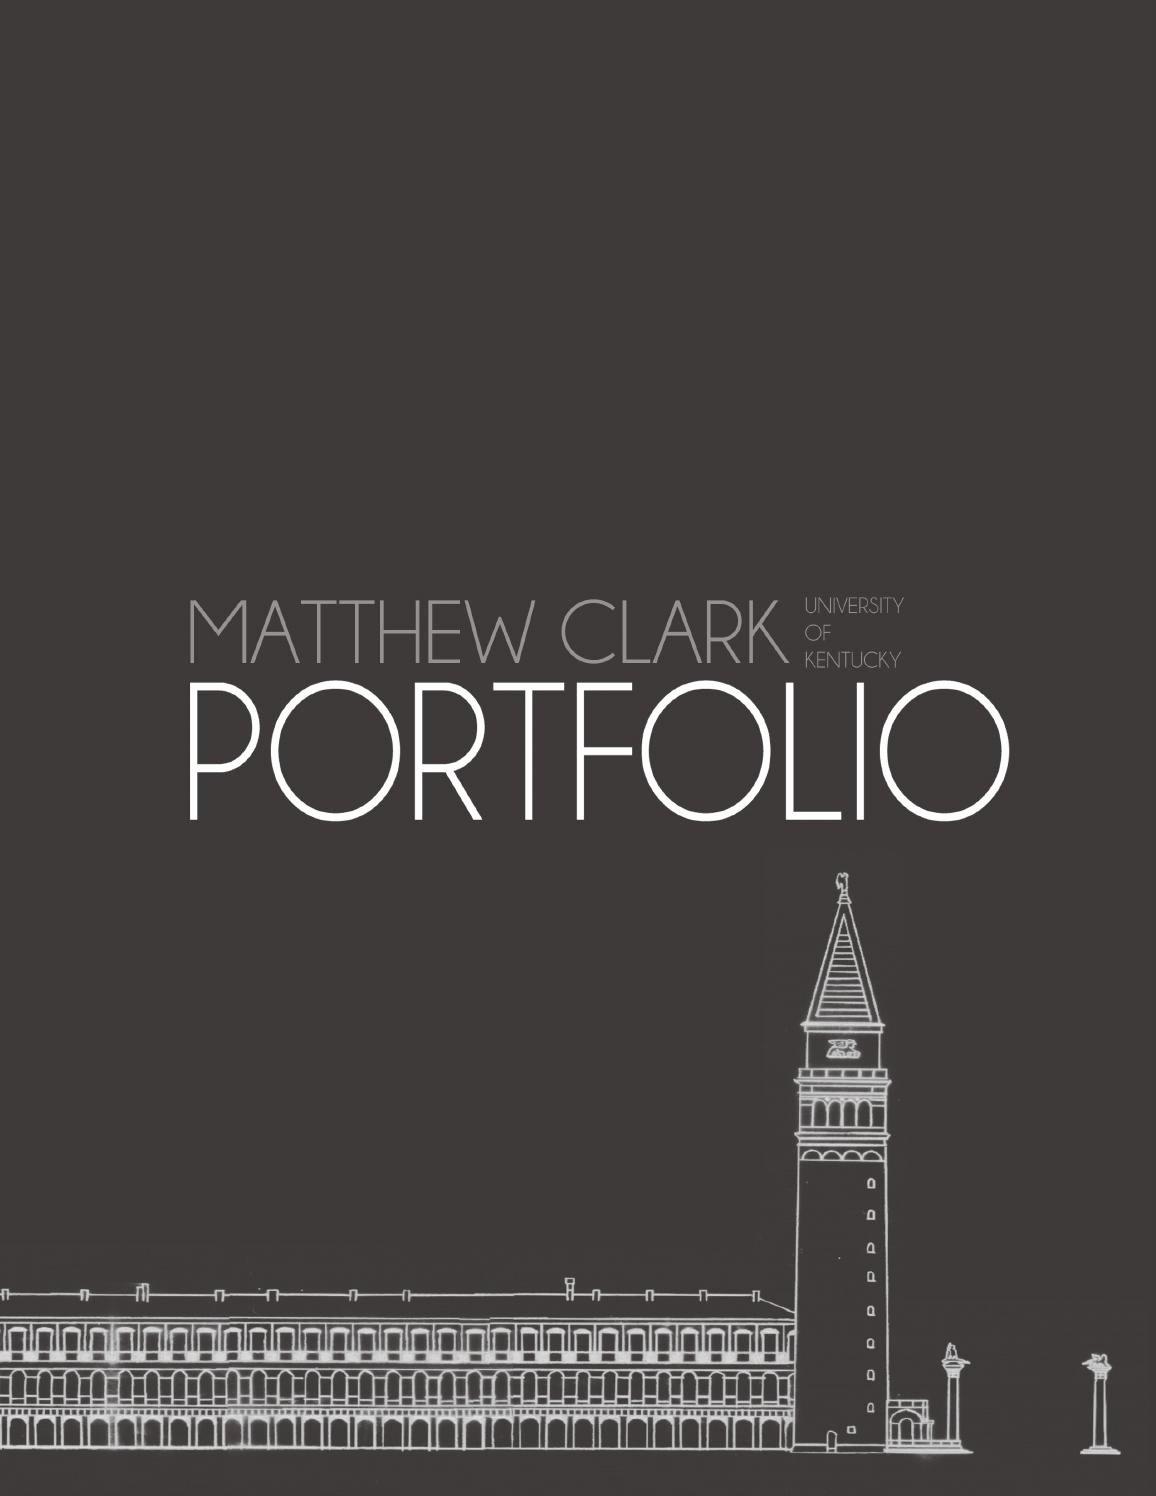 Portfolio Title Page Template Beautiful Matthew Clark Landscape Architecture Portfolio by Matthew